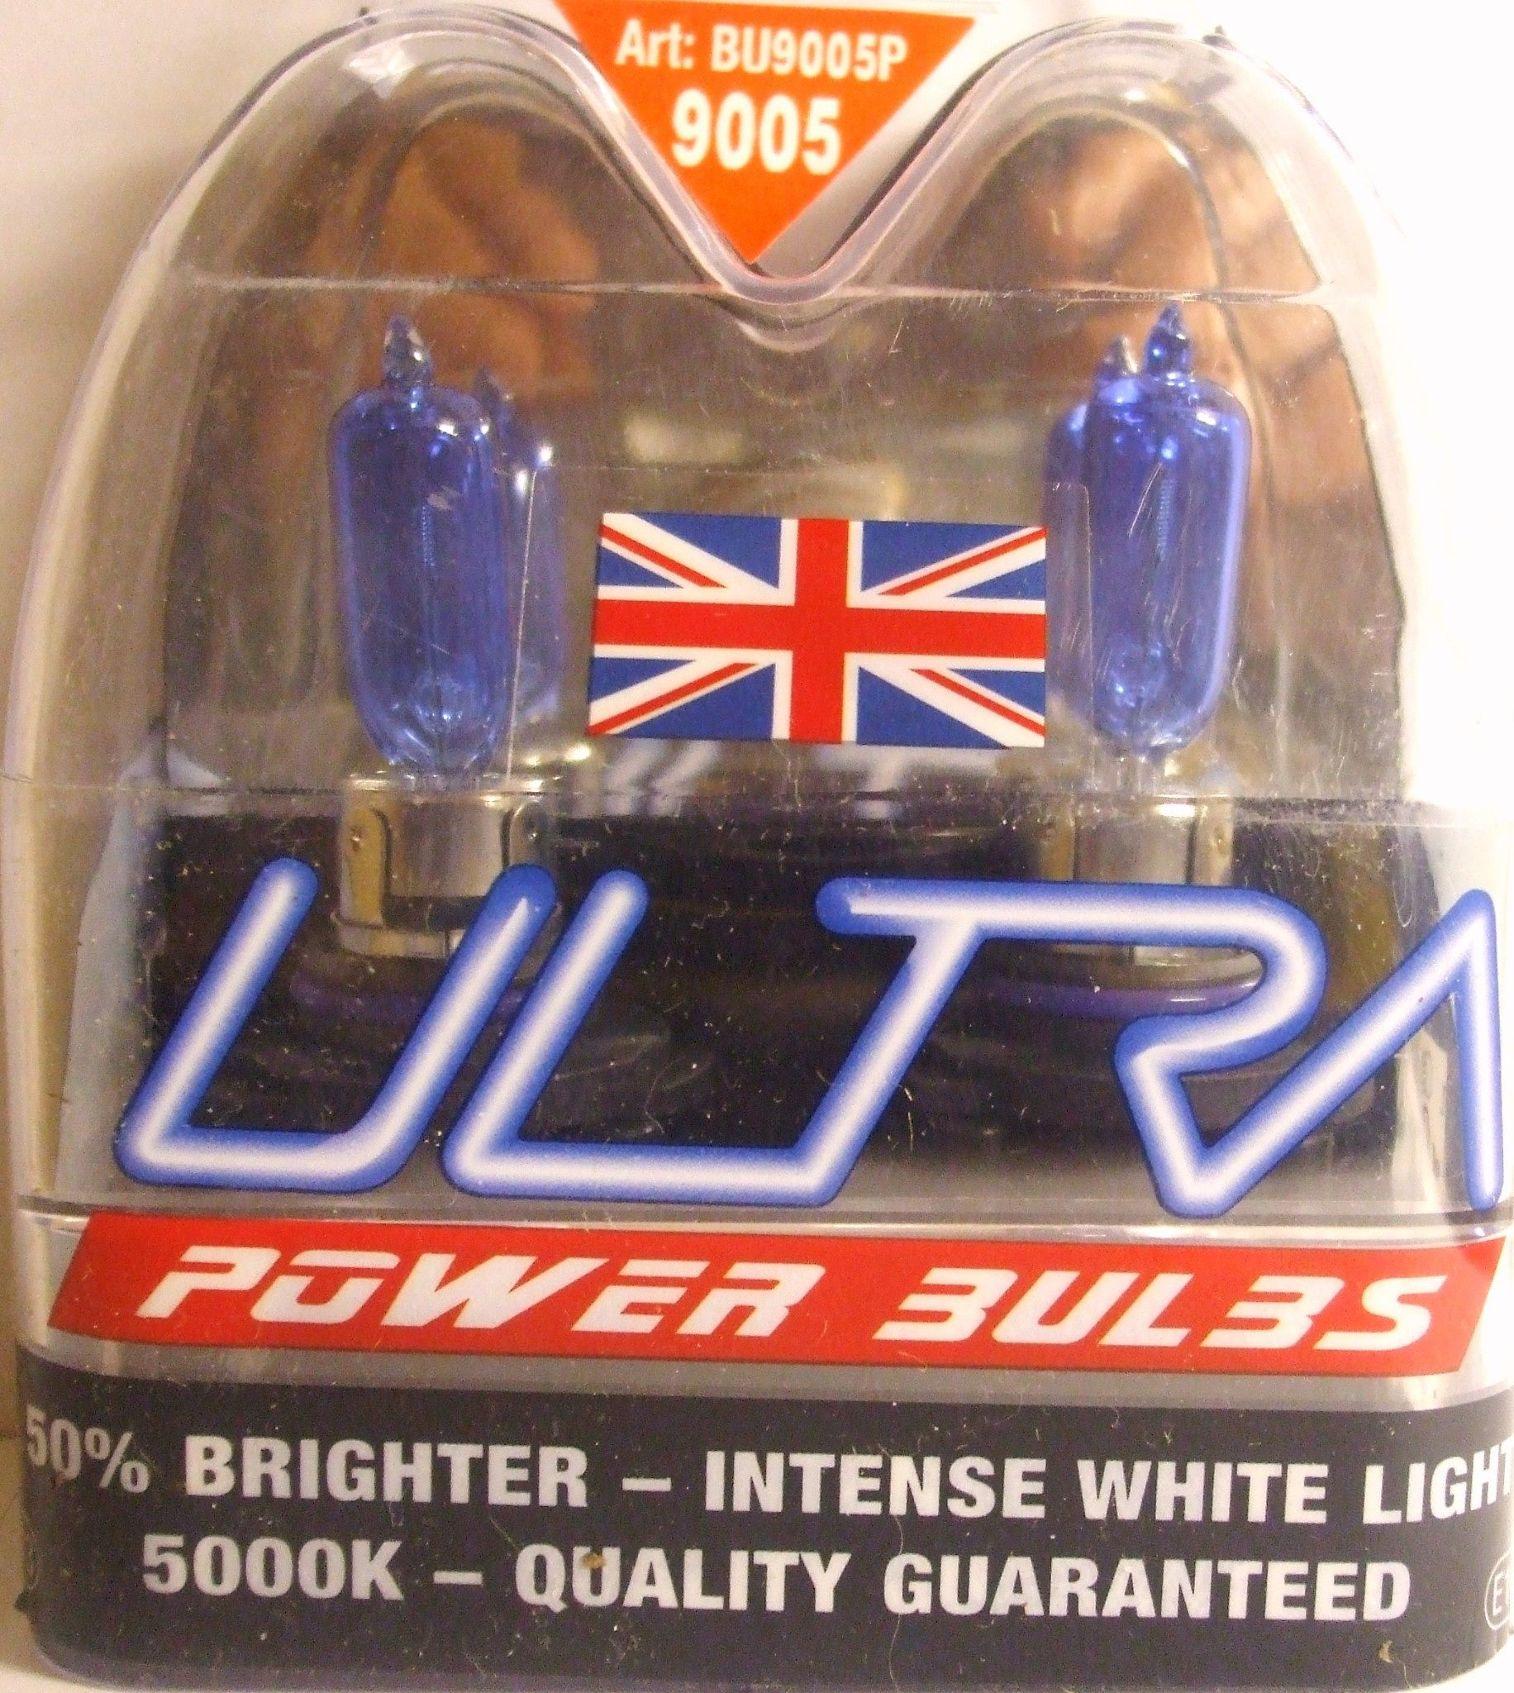 ULTRA POWER BULBS HB3 9005 INTENSE WHITE LIGHT PAIR XENON HB3 ULTRA BULBS 9005